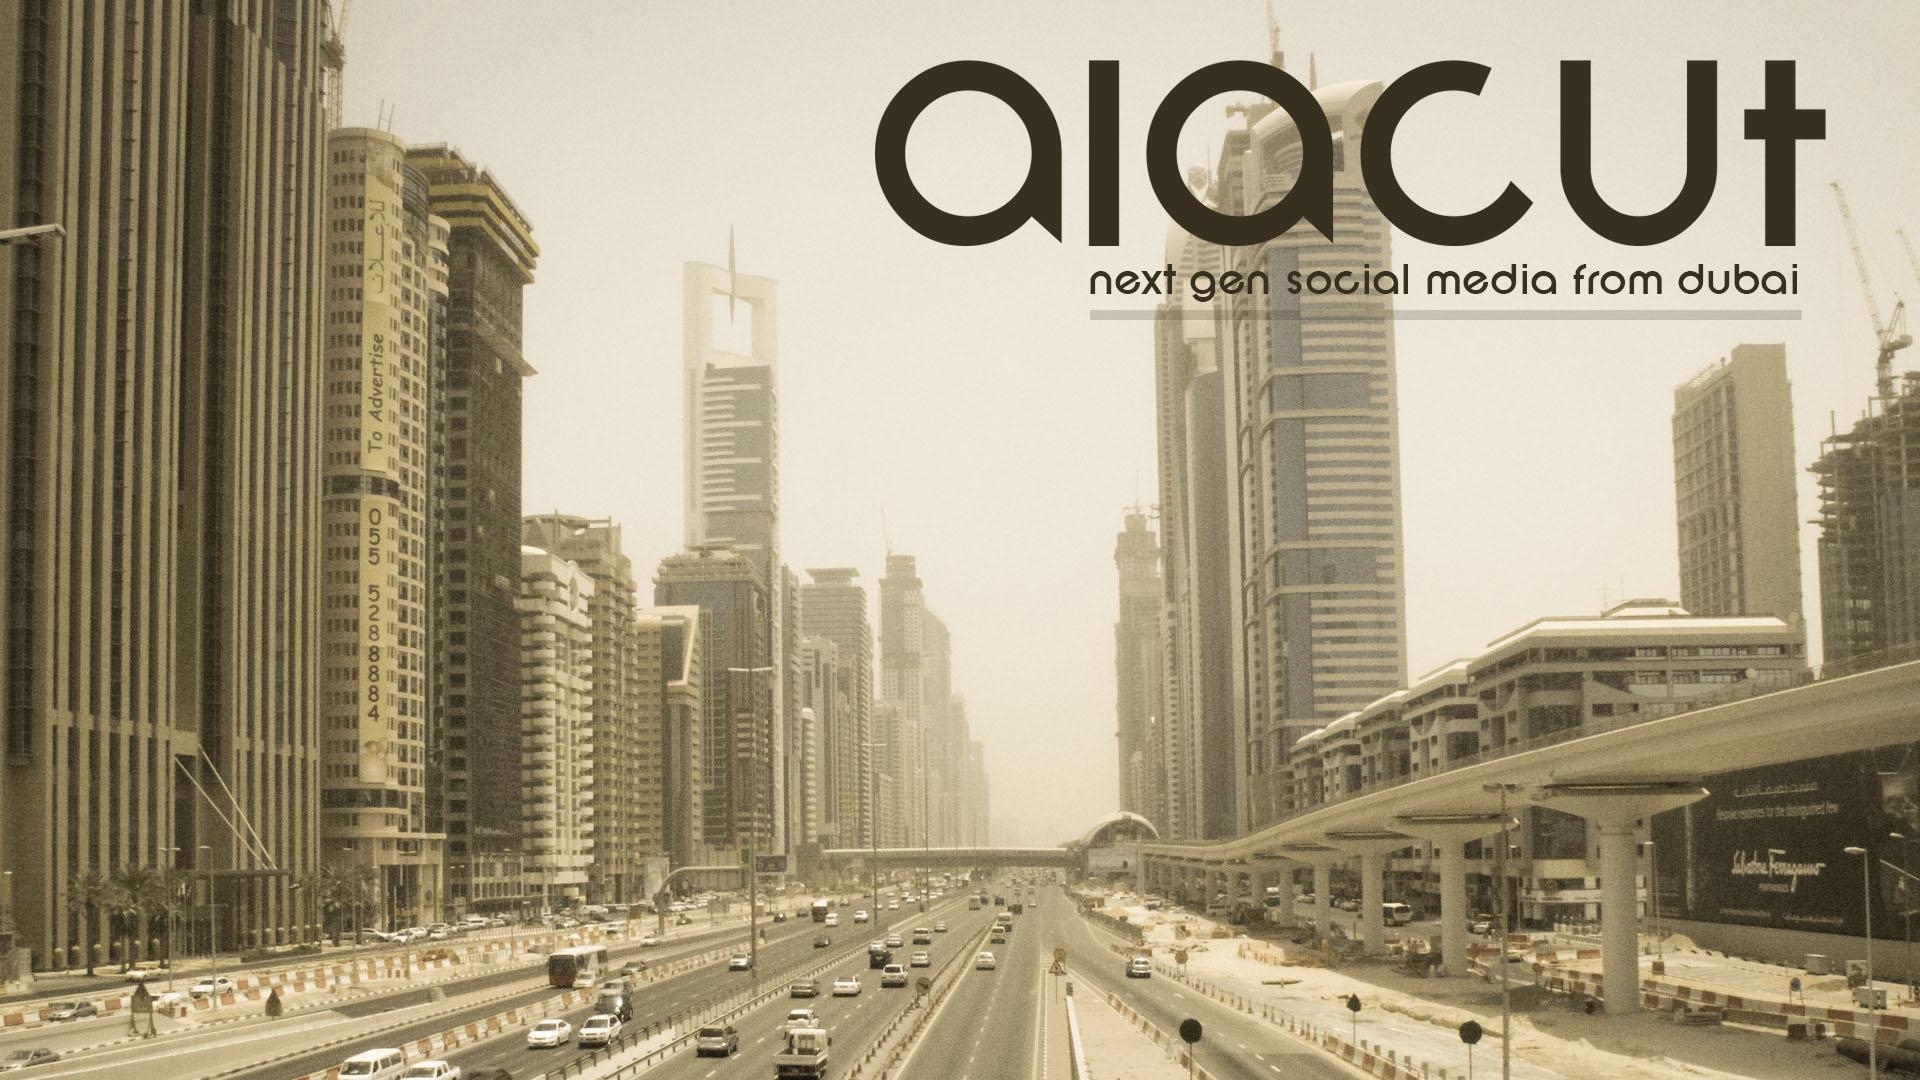 new-dubai-based-social-media-website-to-launch-next-year